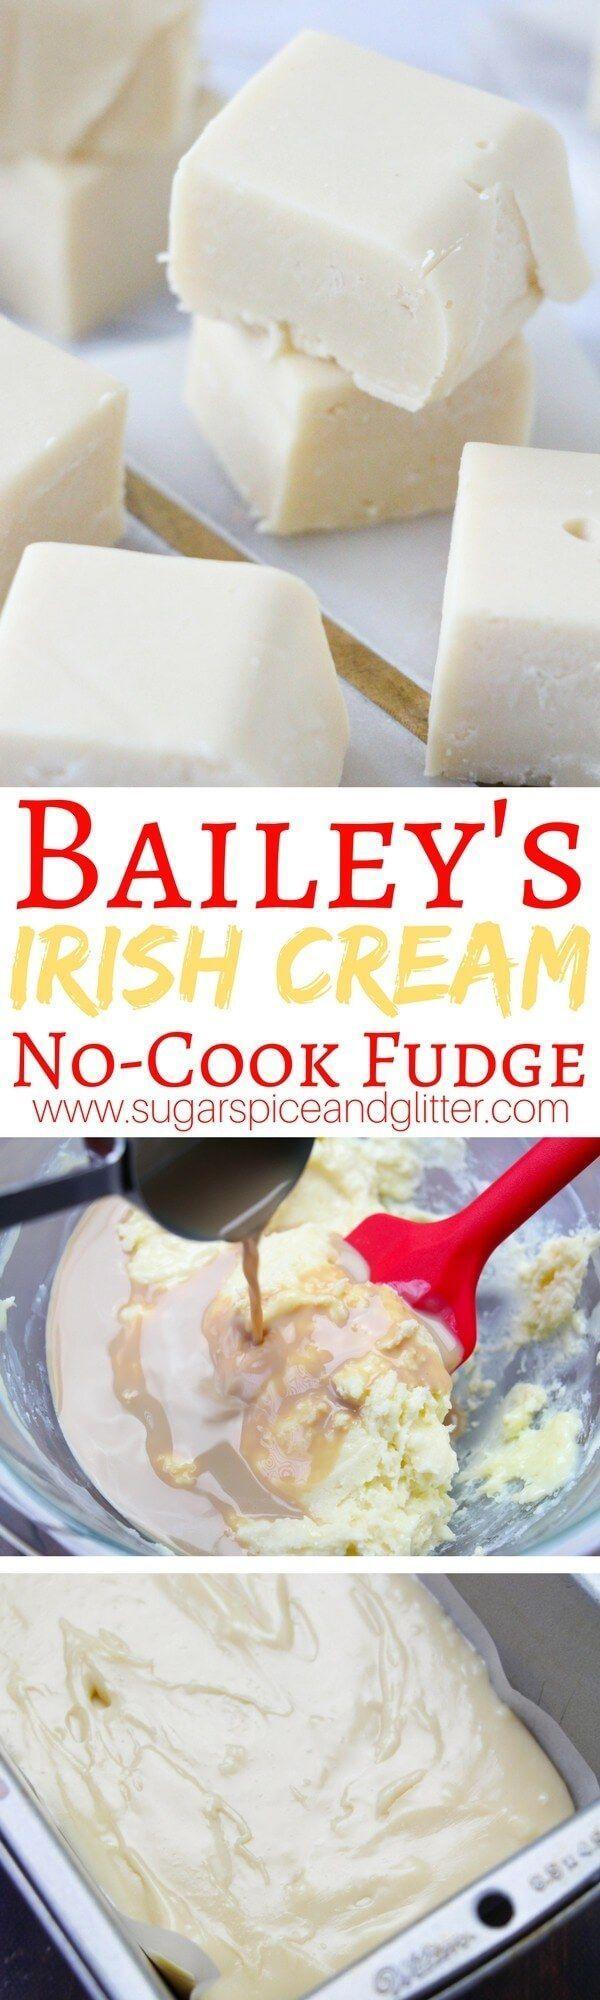 baileys fudge recept